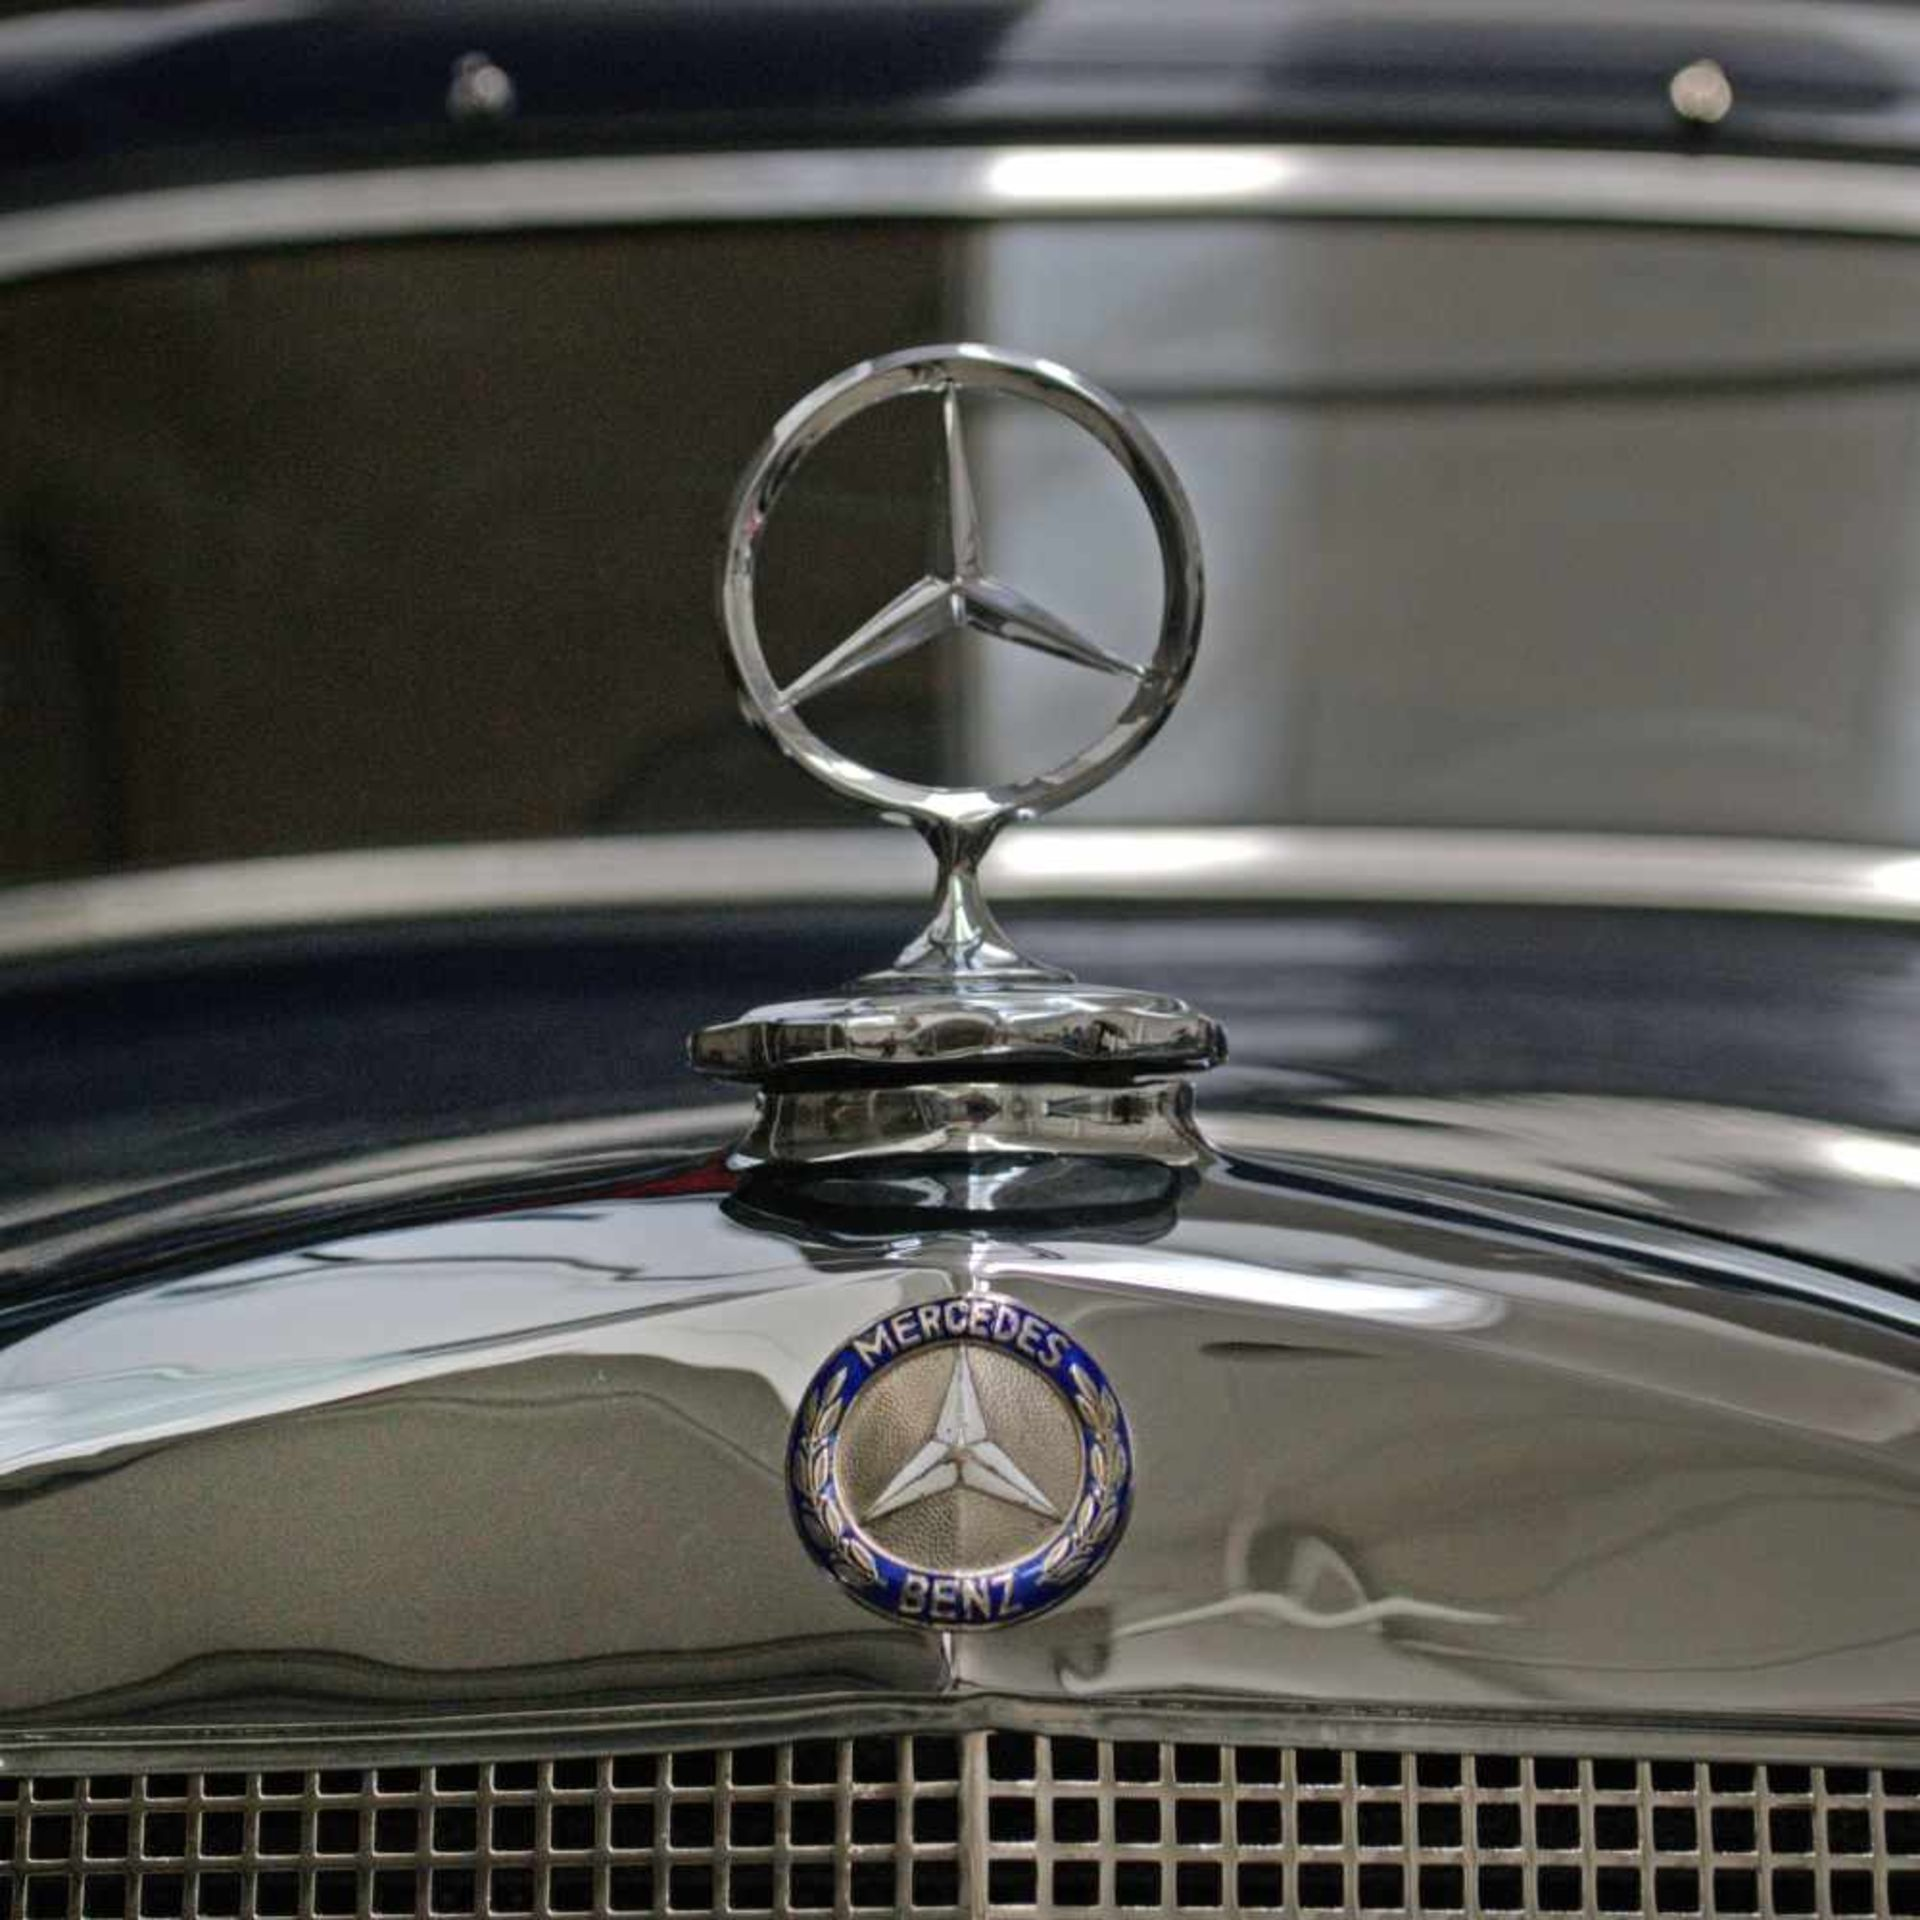 Mercedes 170 V, 1940, the most popular Mercedes-Benz model of the time - Bild 3 aus 4